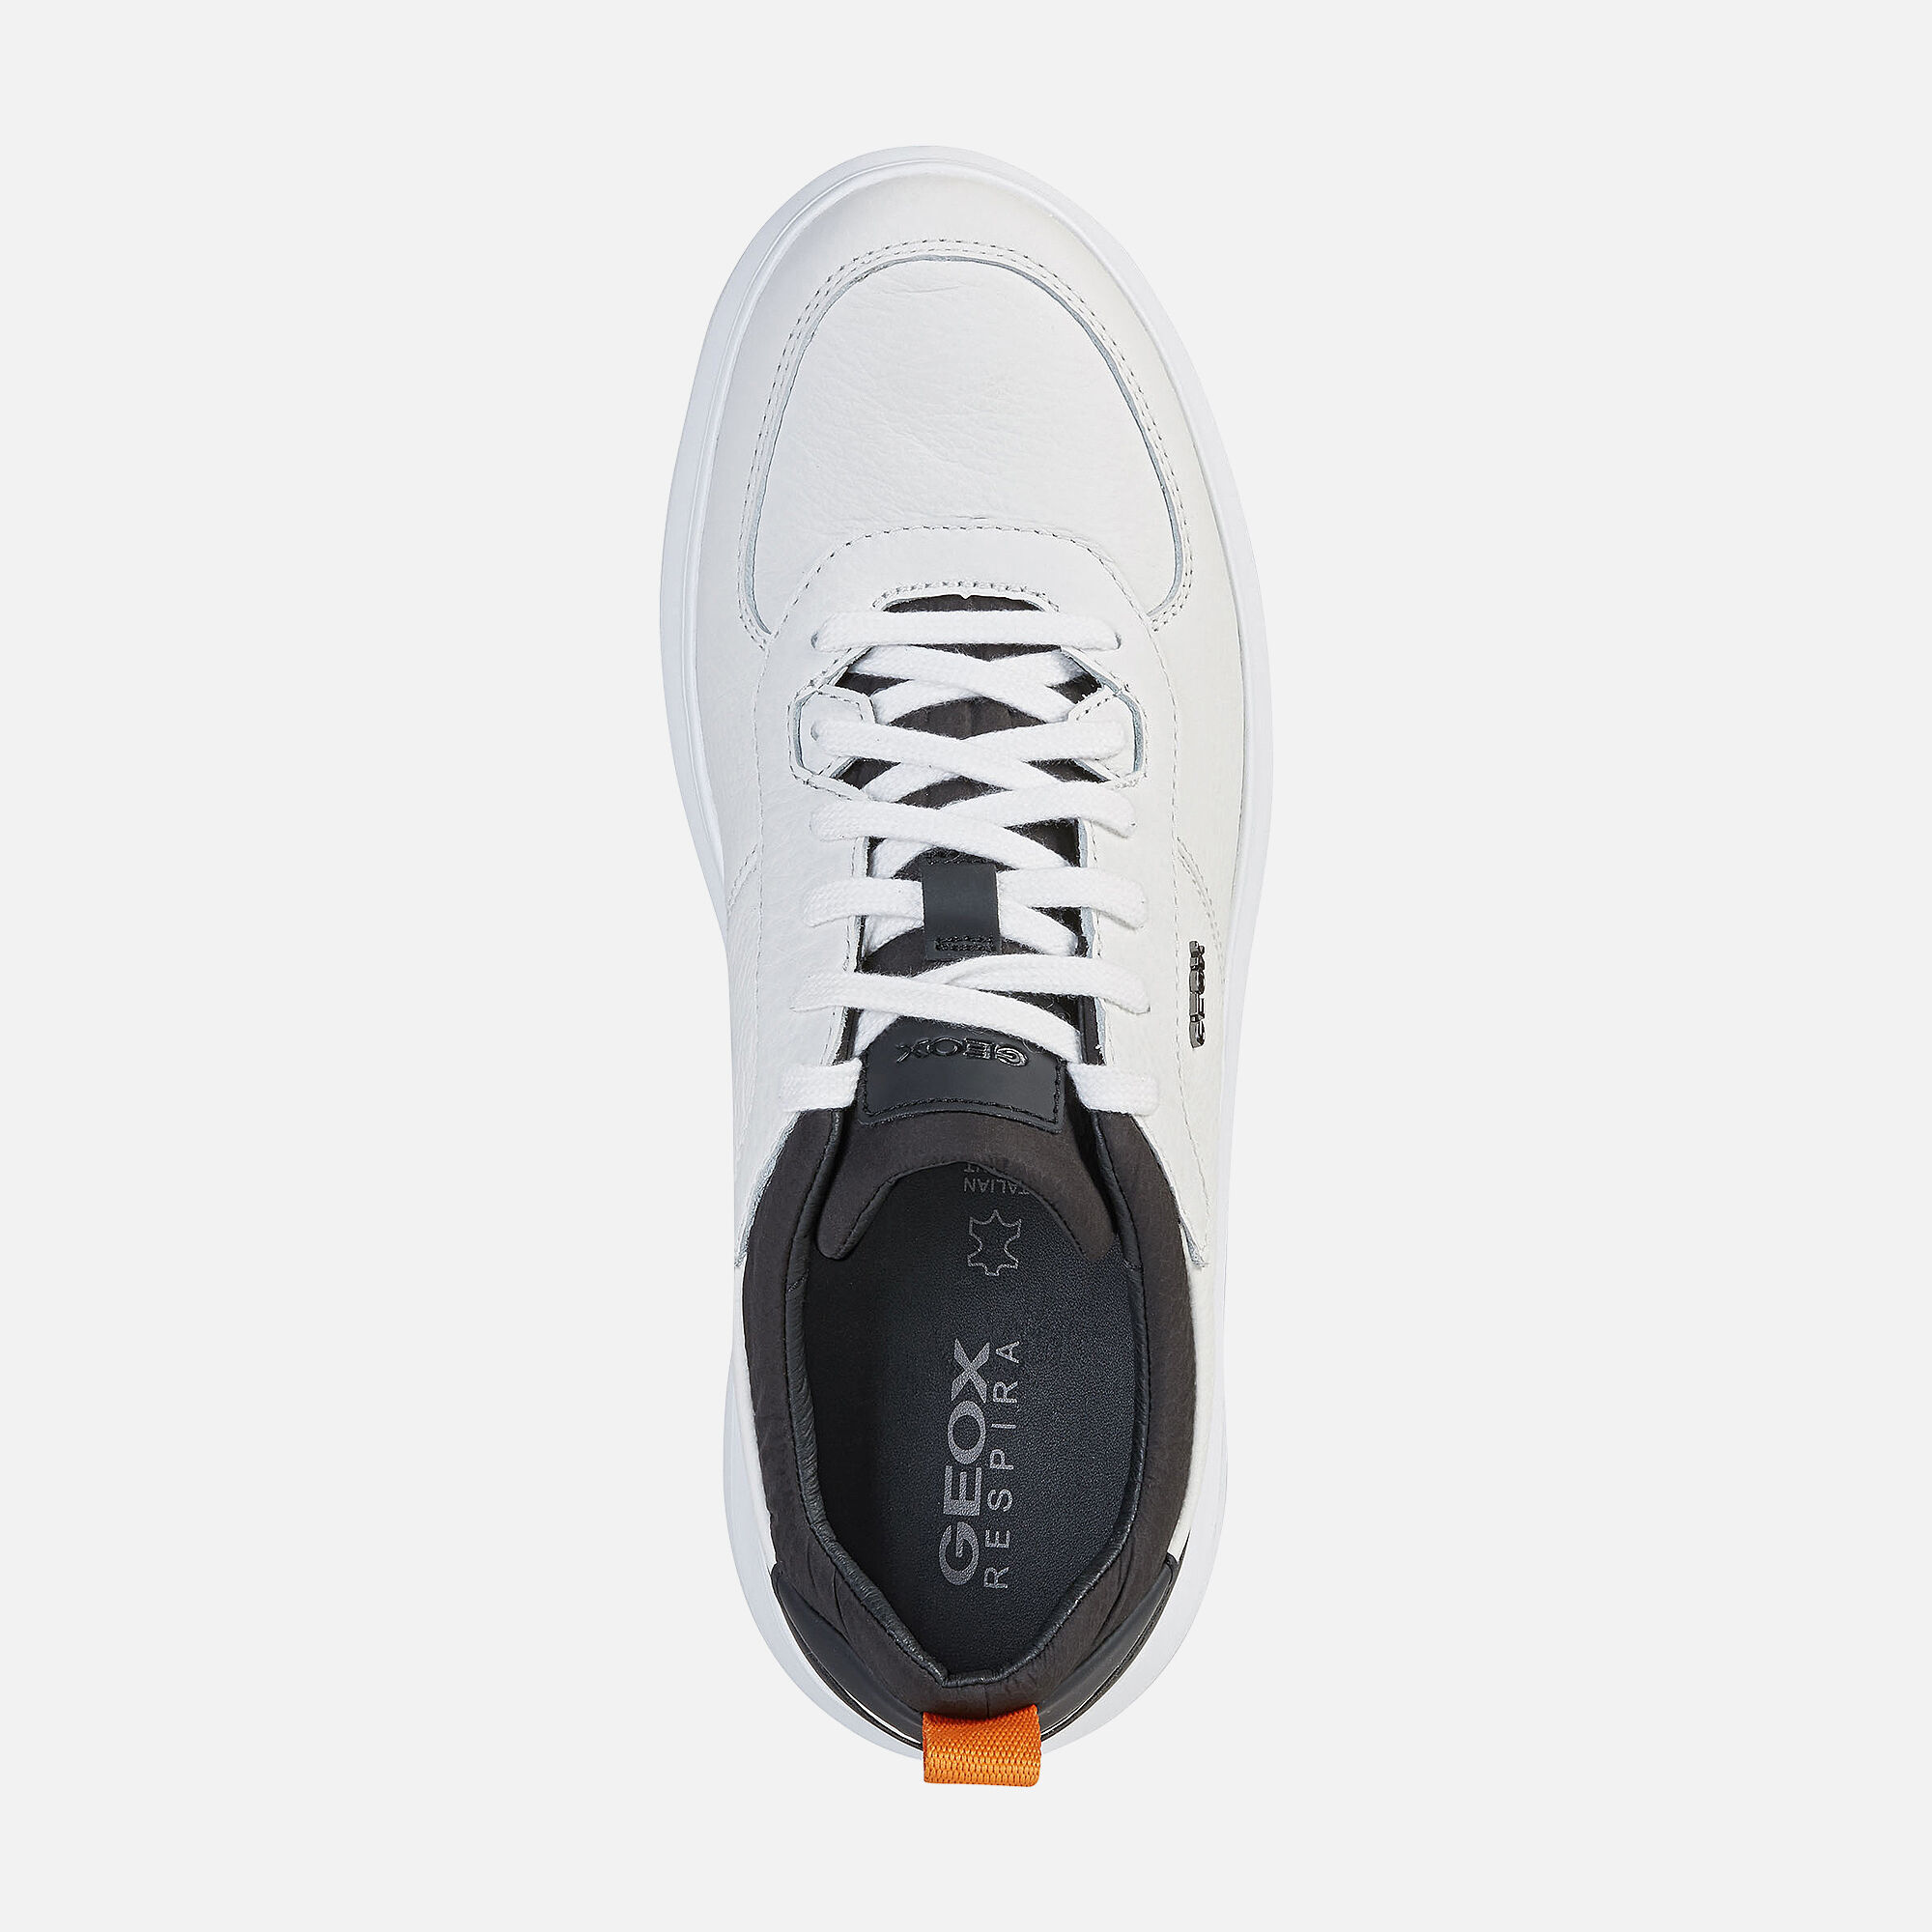 Geox MAESTRALE Man: White Sneakers